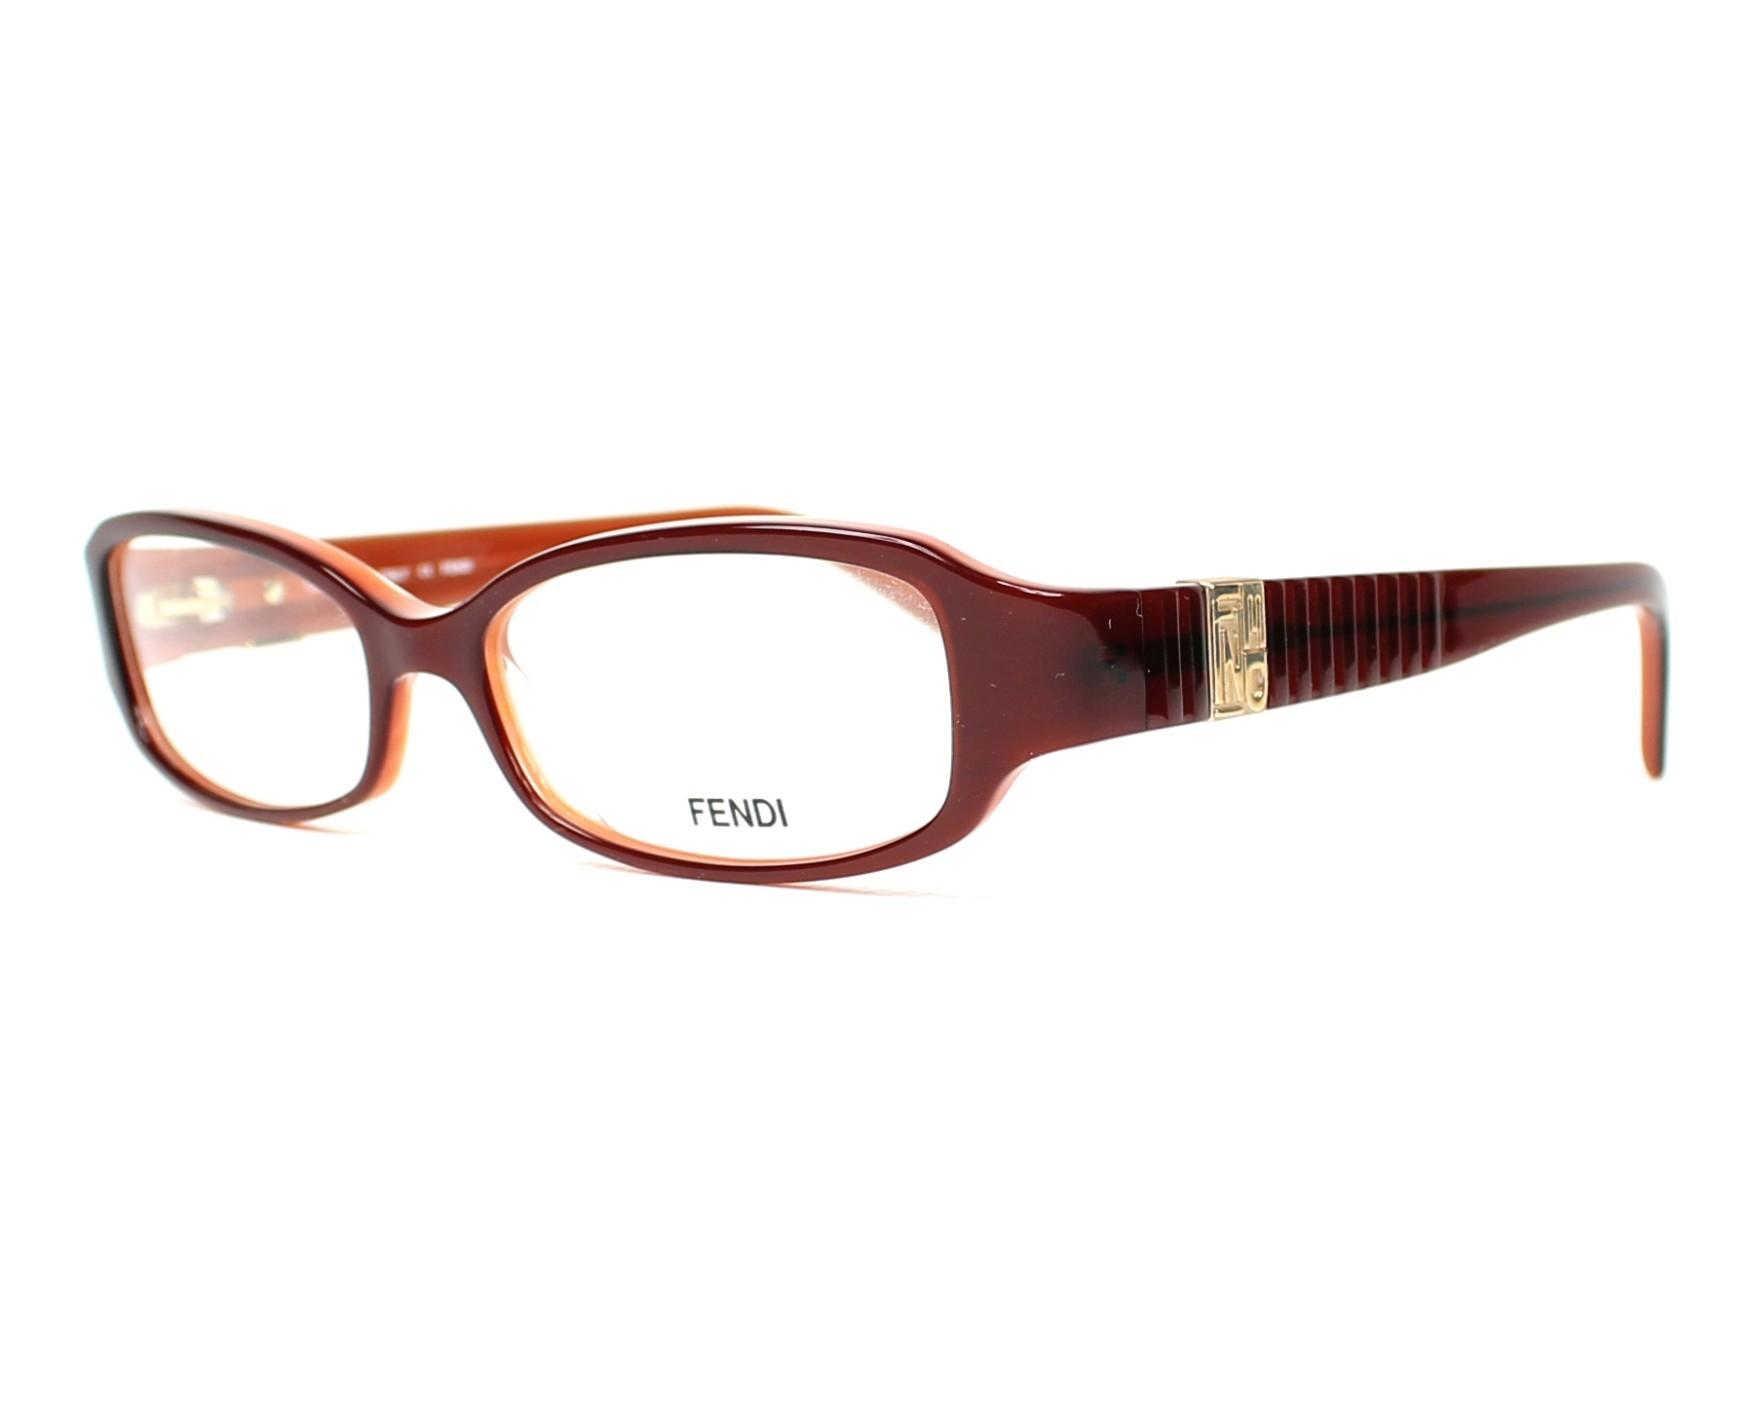 achat lunettes de vue fendi f 744 613 visionet. Black Bedroom Furniture Sets. Home Design Ideas